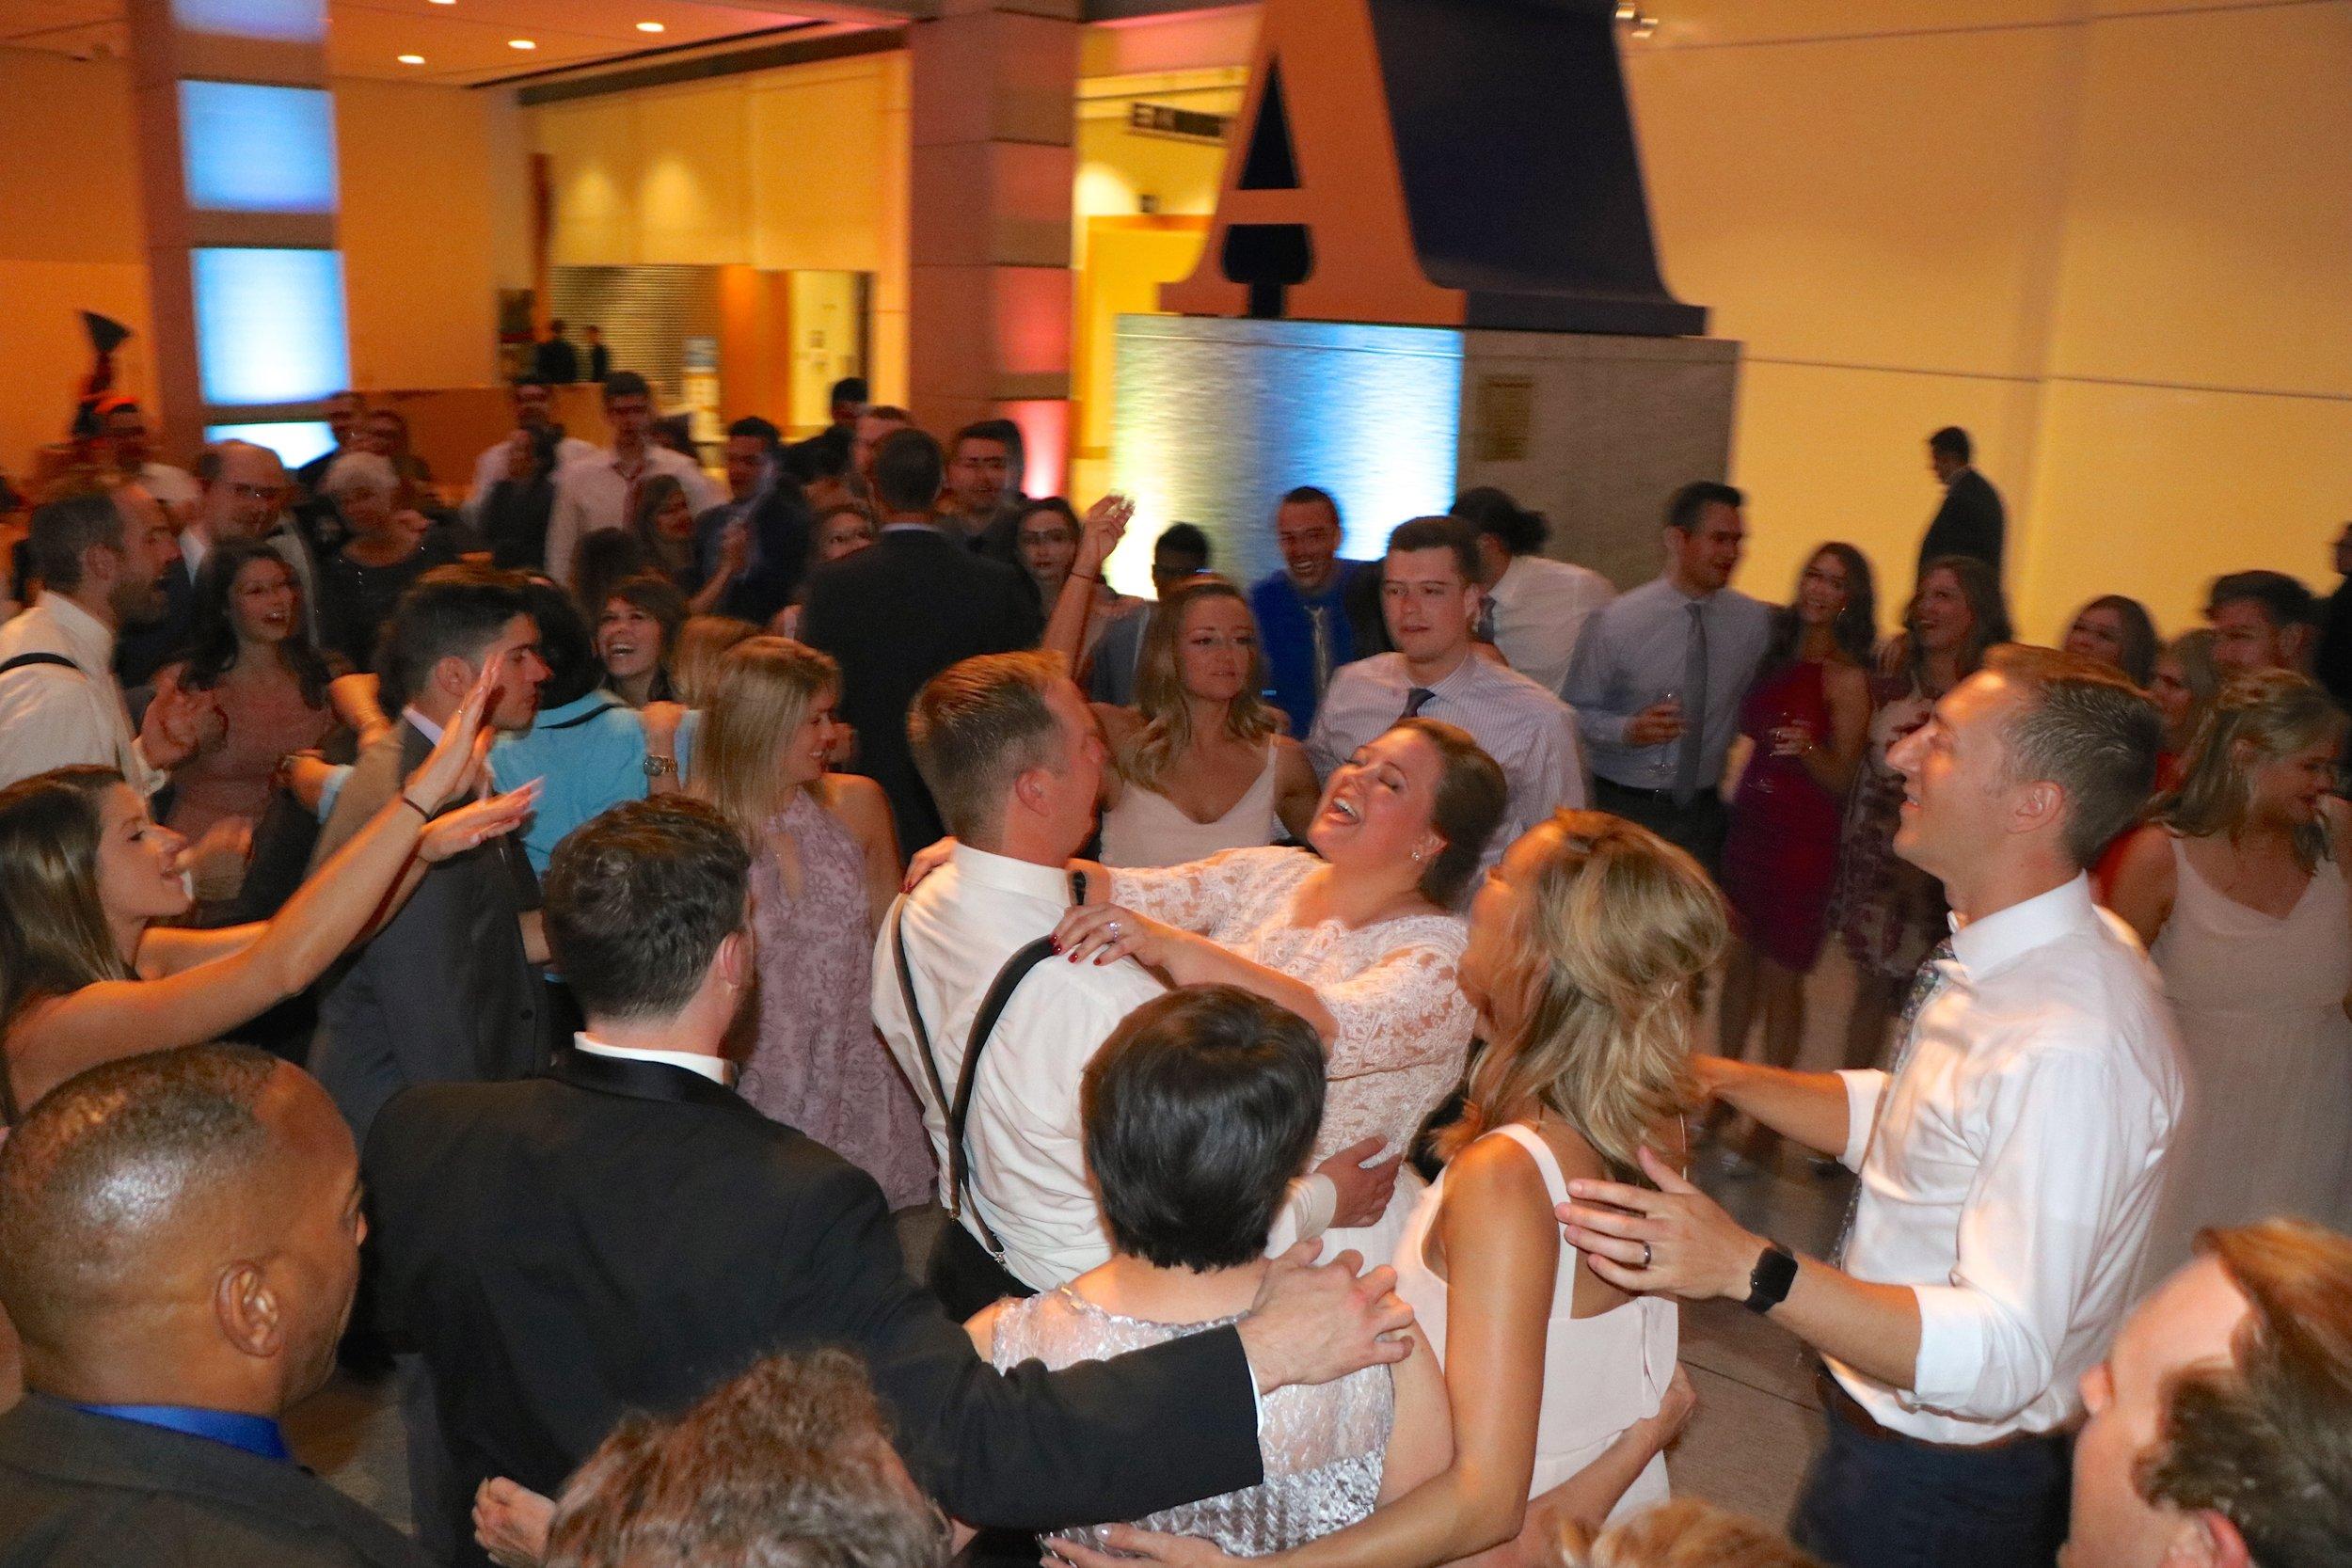 Kelsey & David Finale Sing by Indianapolis Wedding DJ Jim Cerone